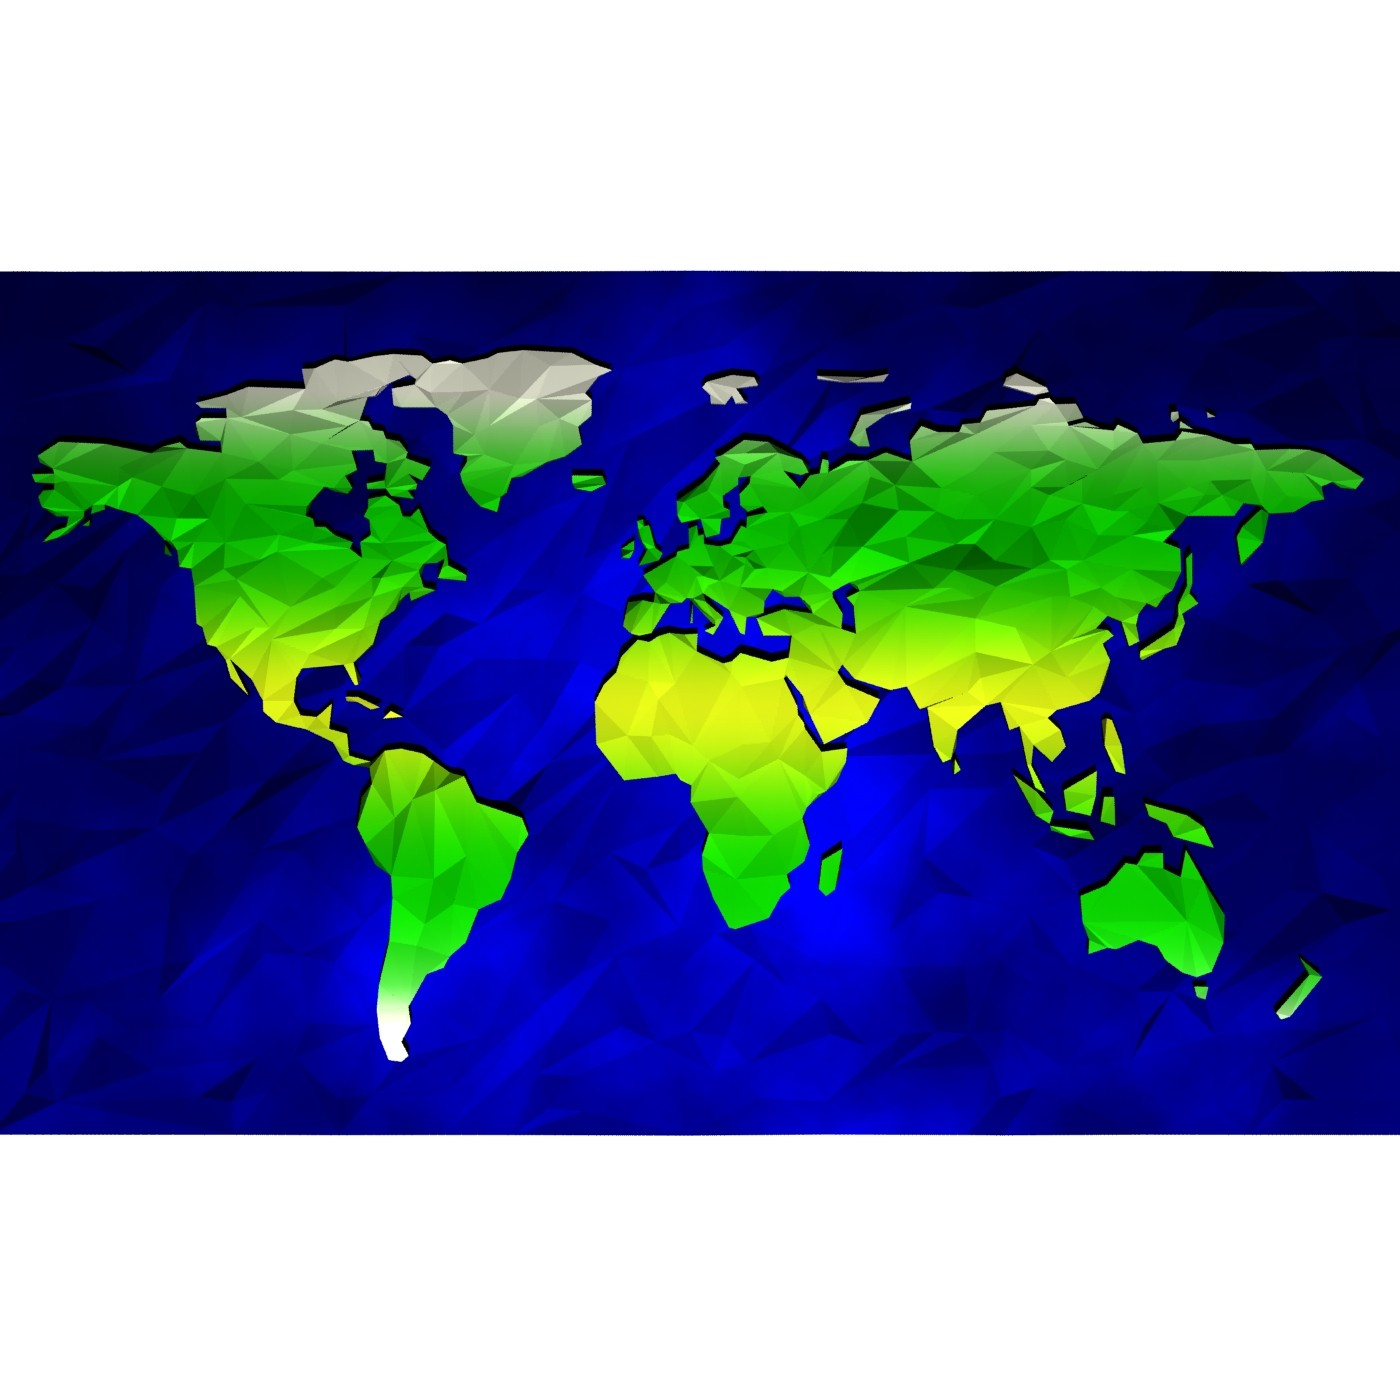 Cartoon low poly world map 1.jpg